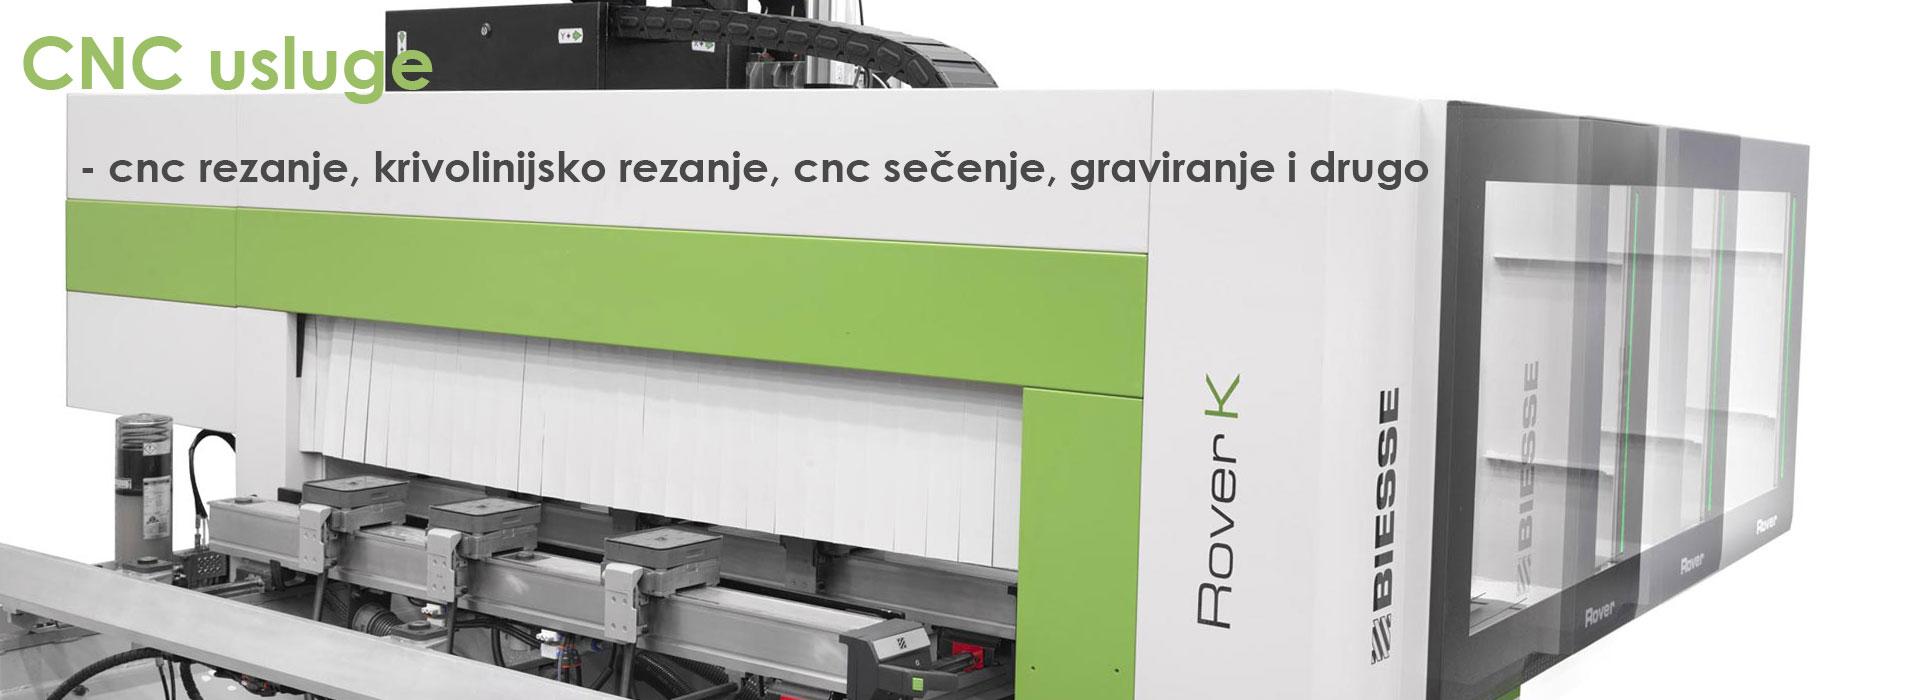 CNC usluge